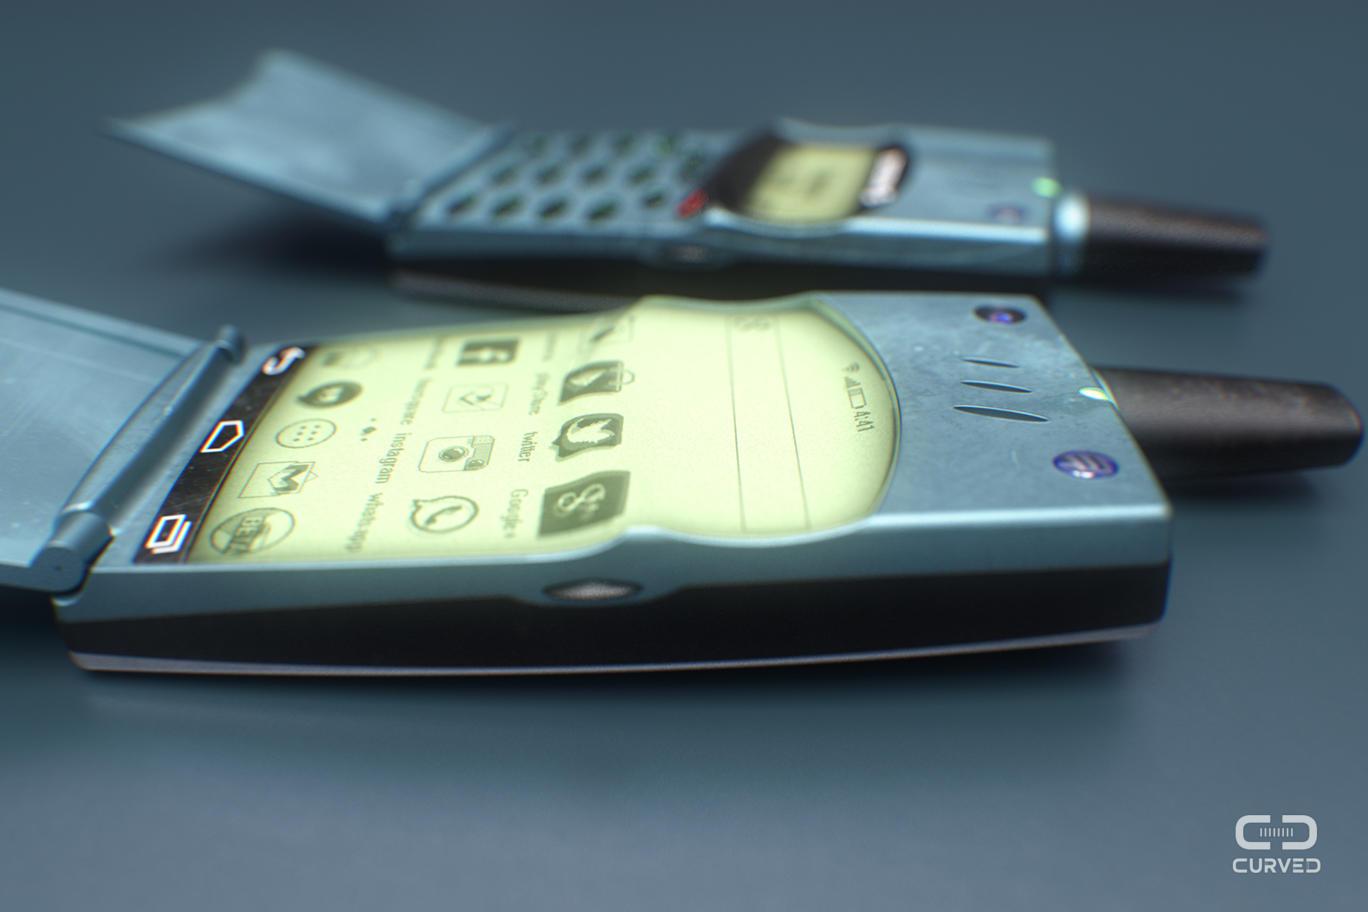 картинка телефон нокиа 3310